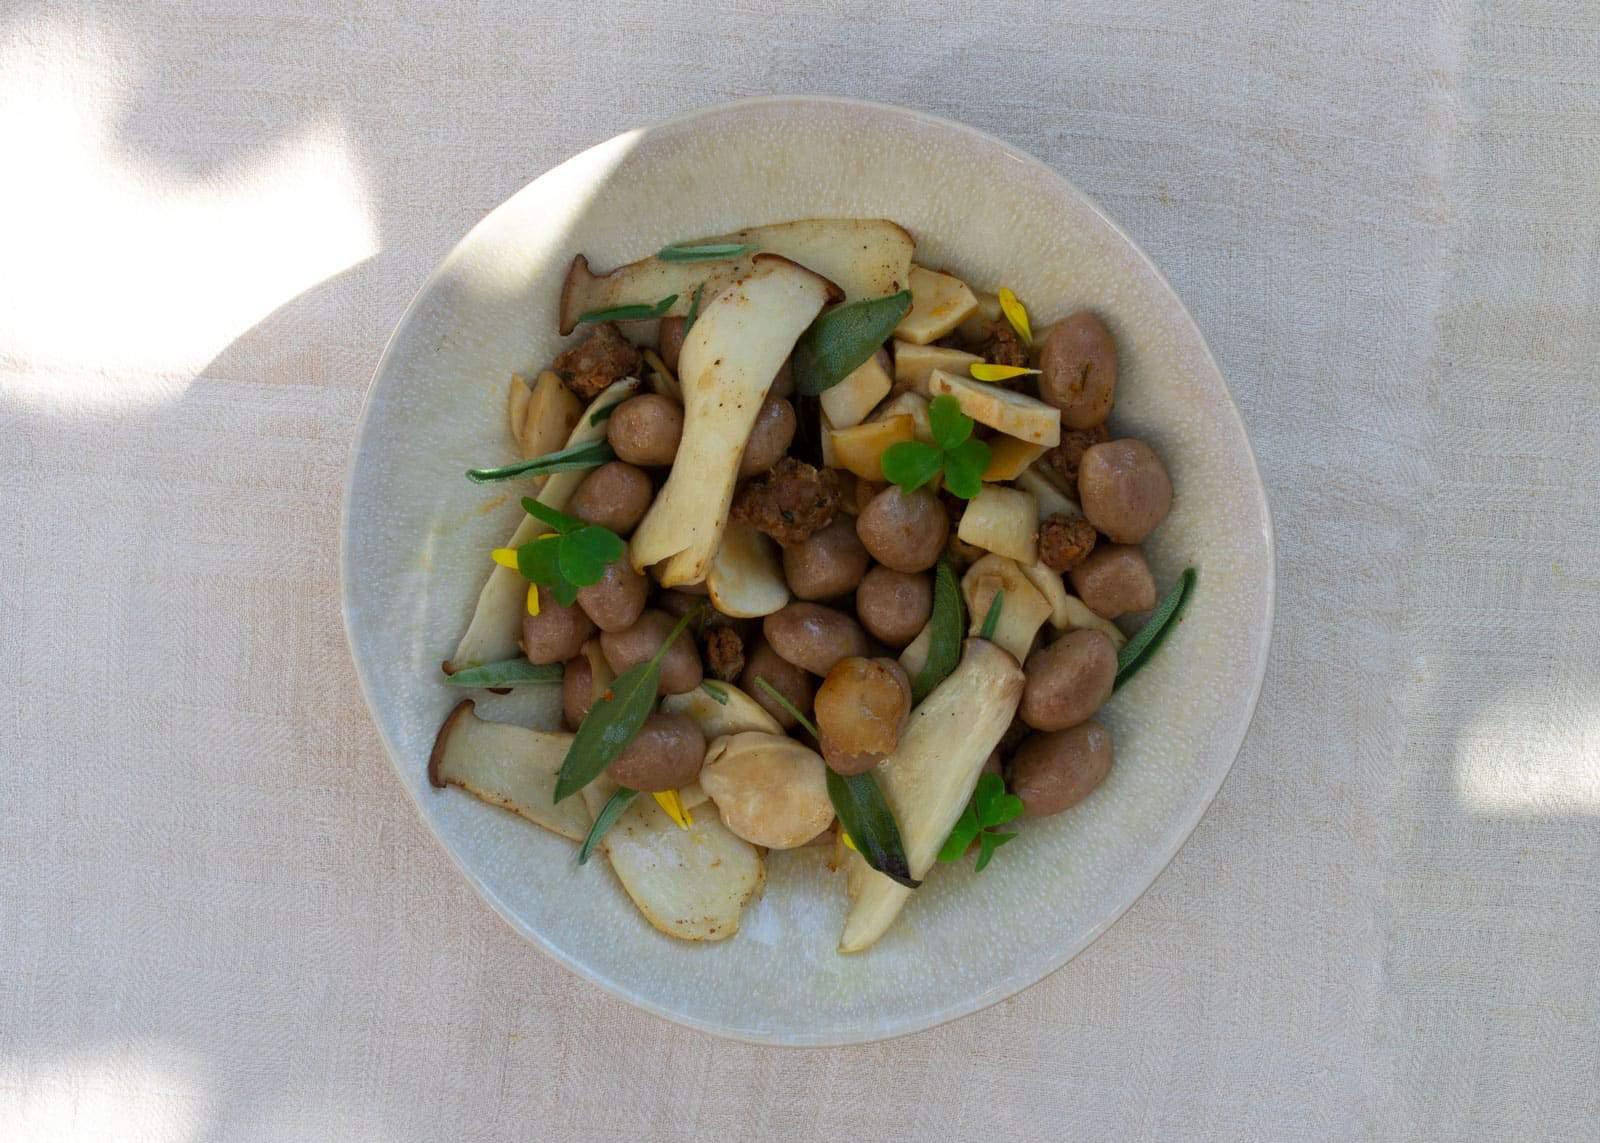 Kartoffel-Maroni-Gnocchi mit Pilzen und Luganega -Rezept